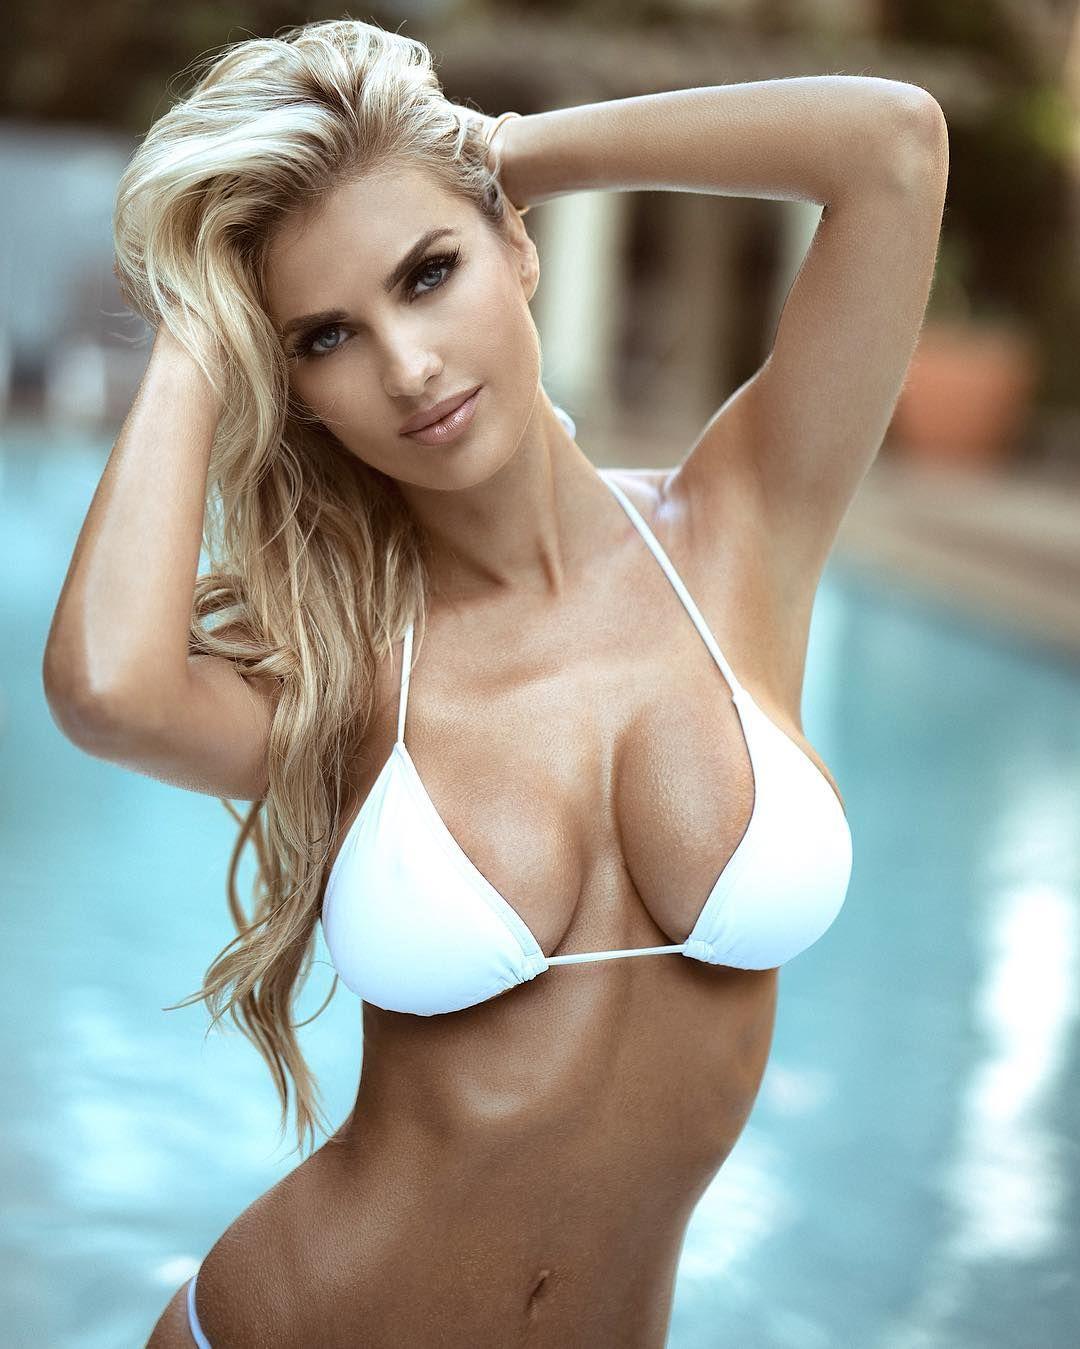 Nude Tits Model